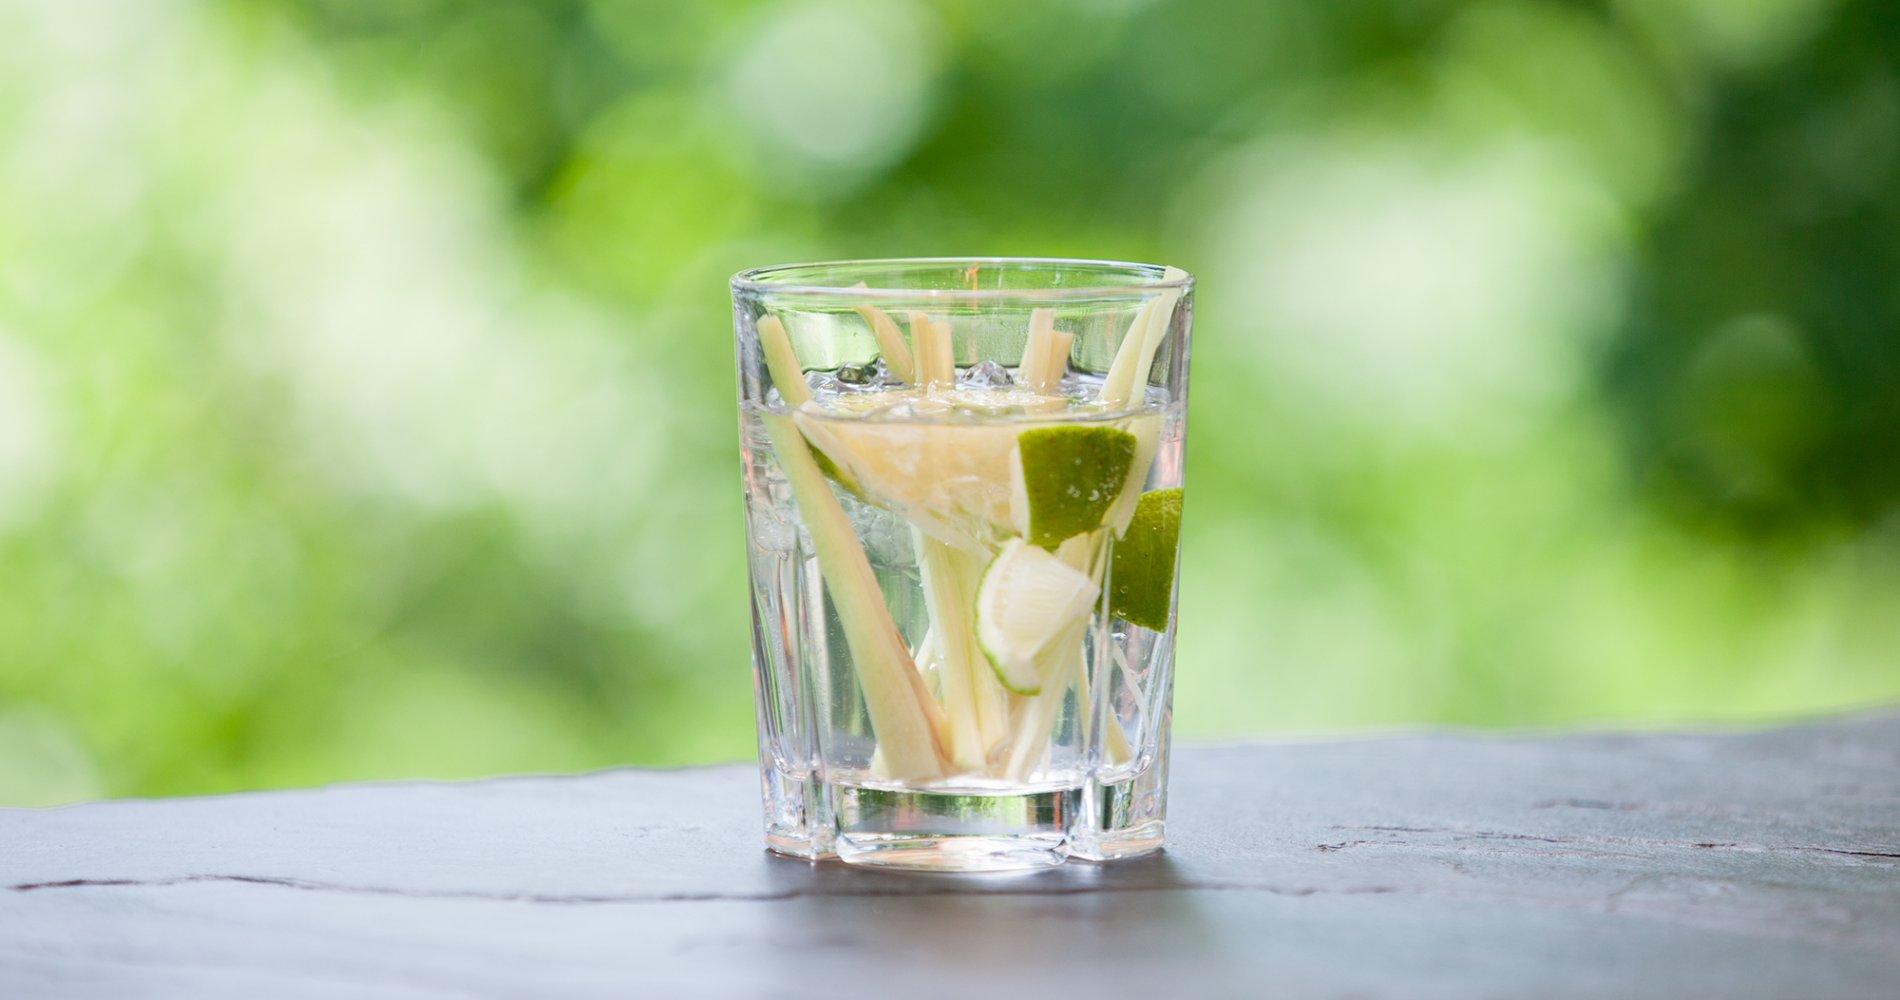 Low Carb: Zitronengraslimonade - mit Limette